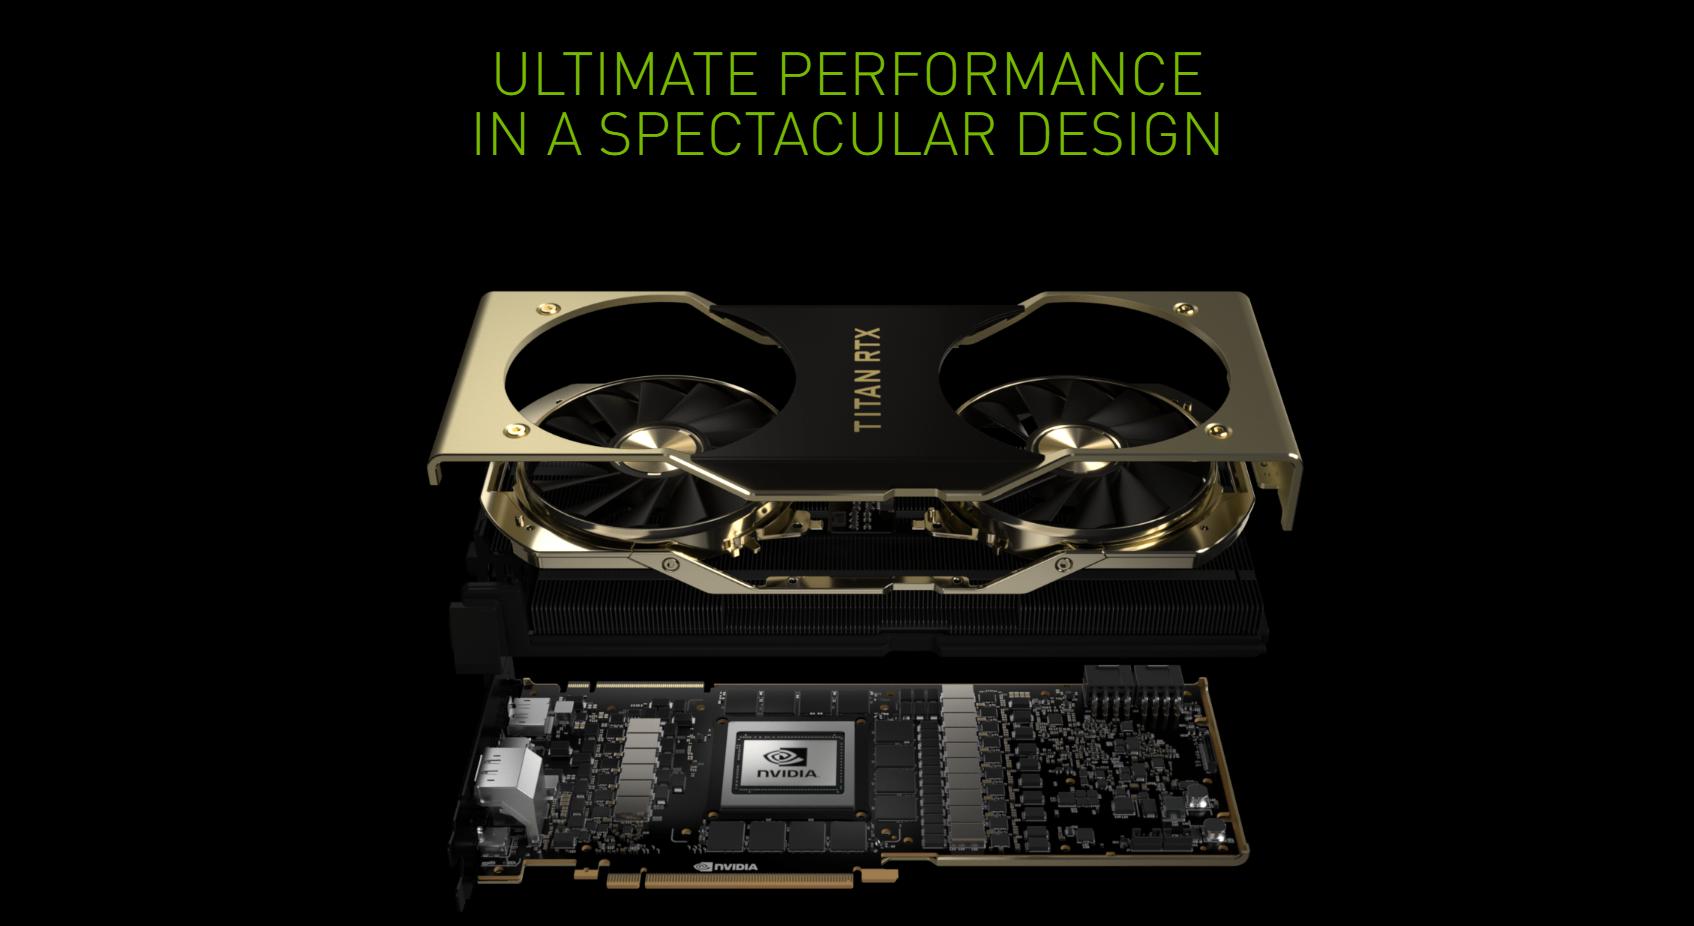 NVIDIA Titan RTX Flagship Graphics Card 3DMark Benchmark